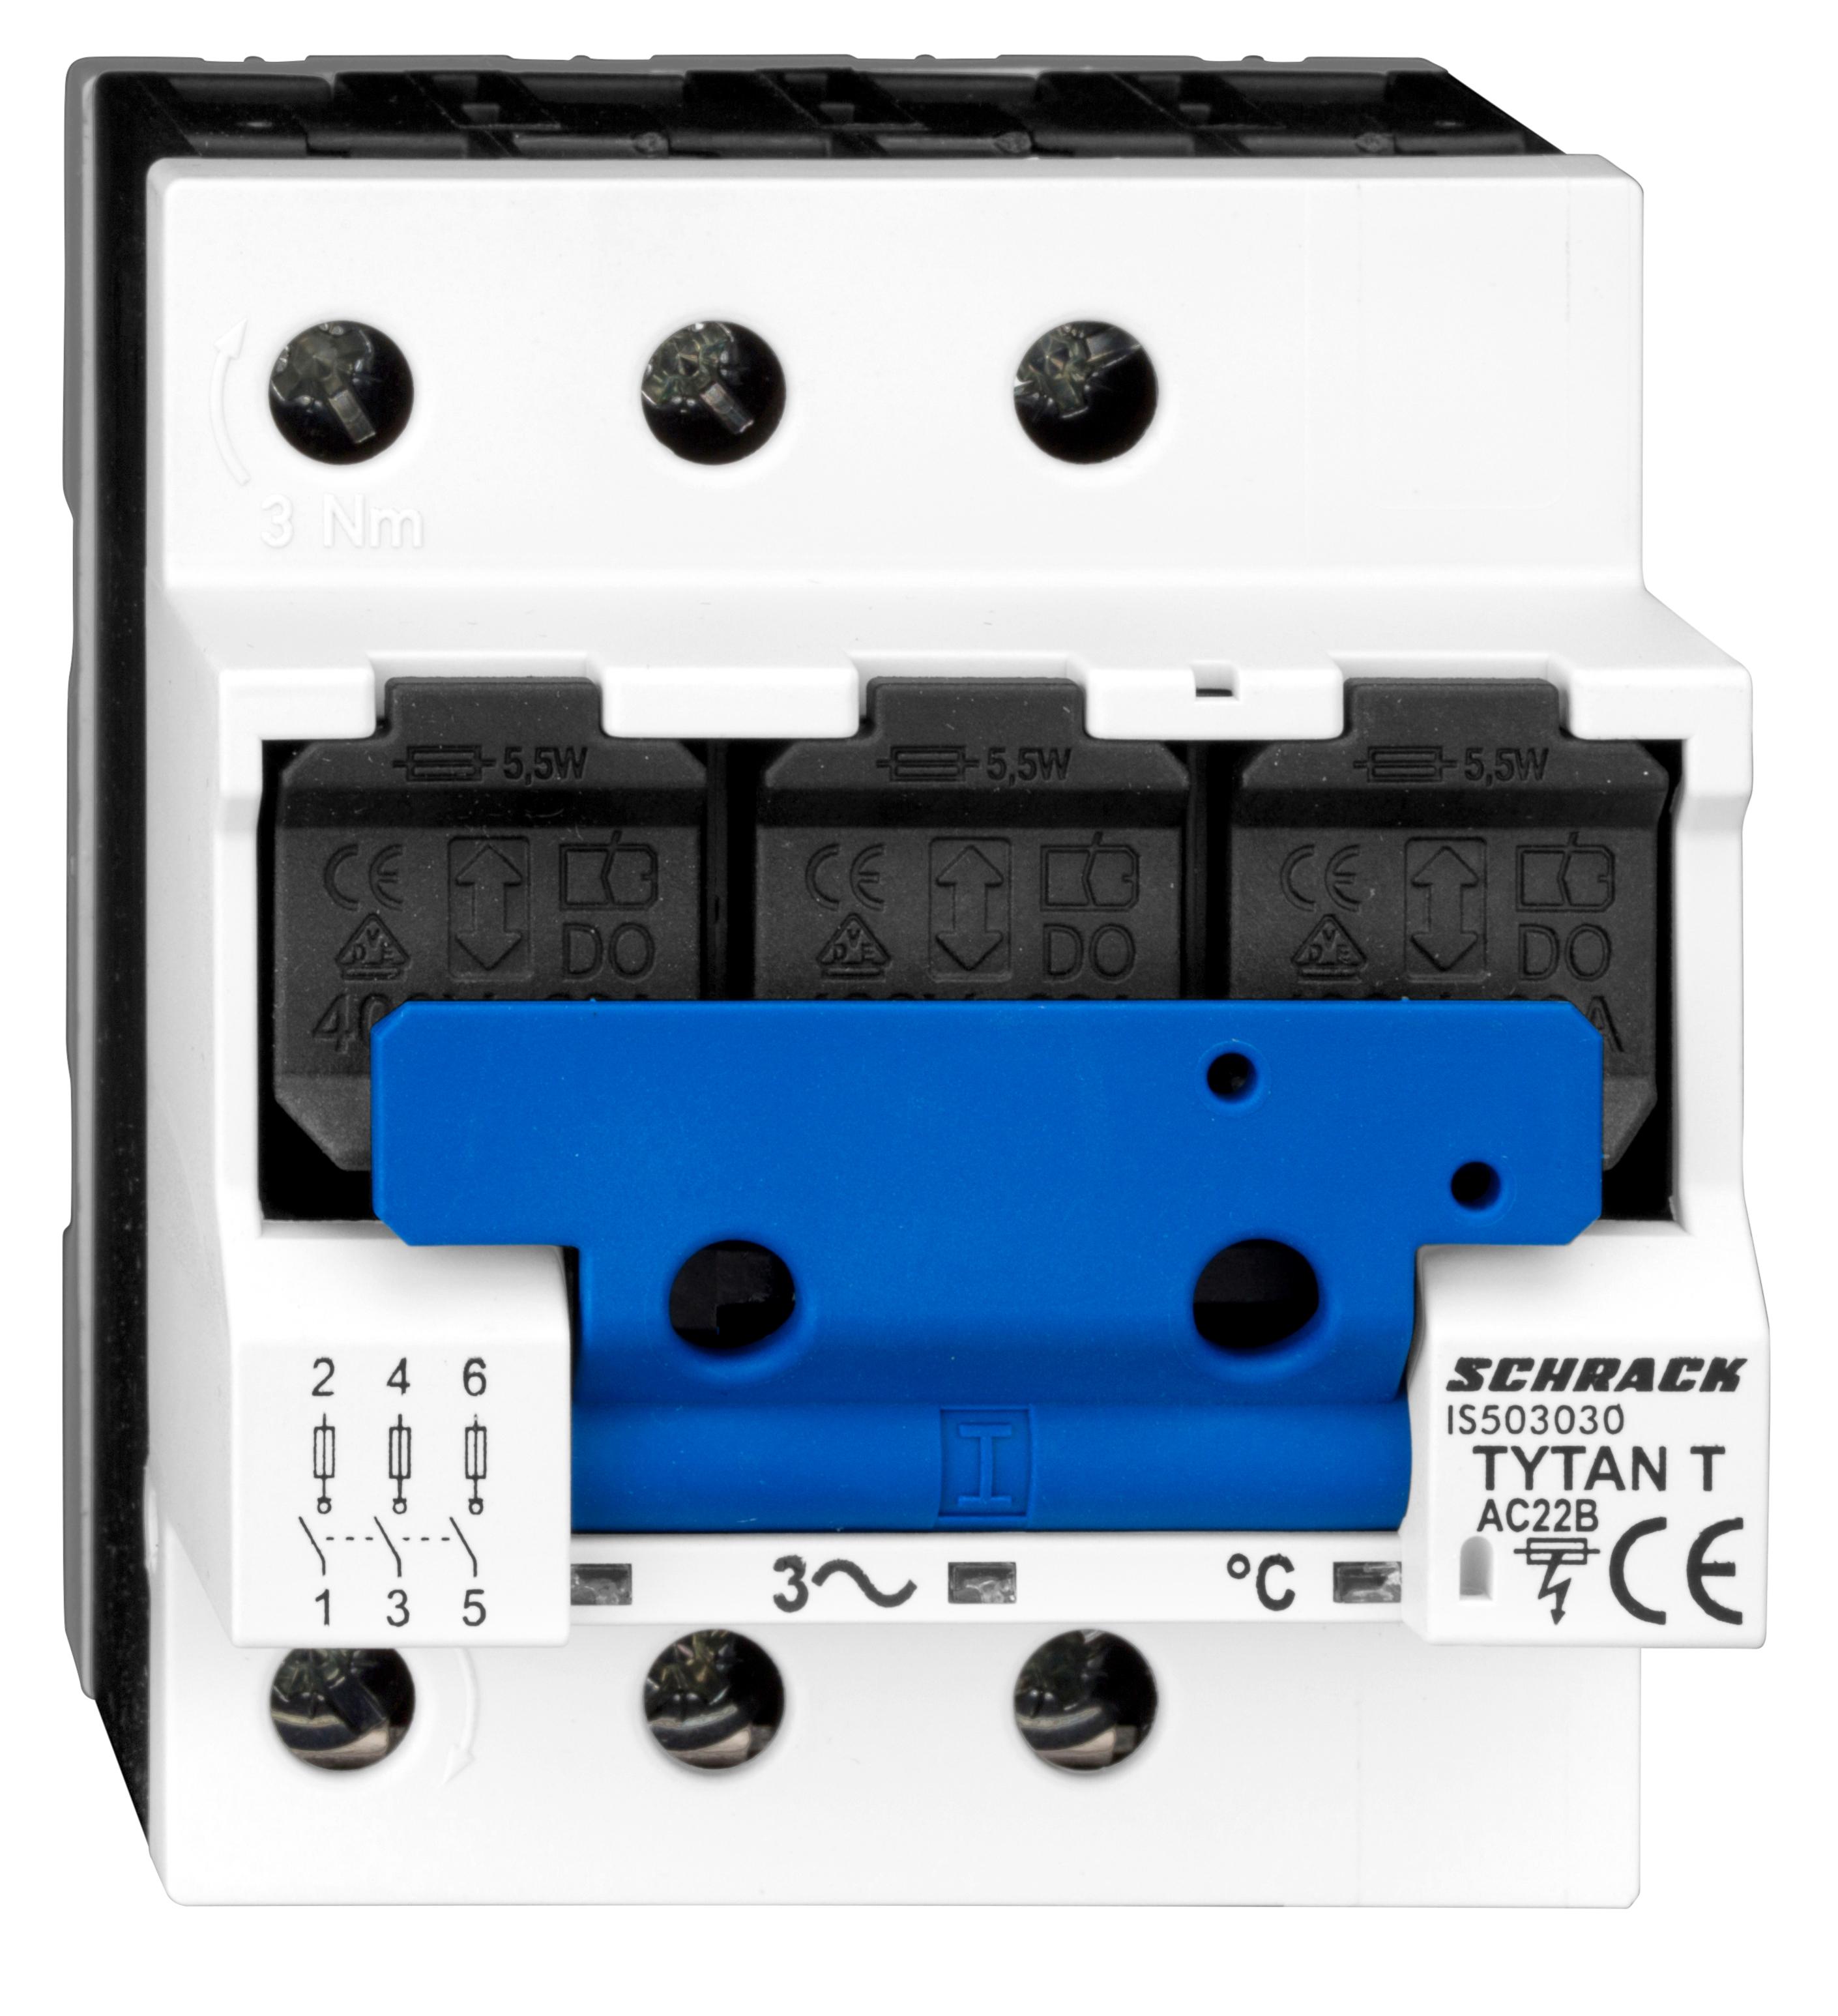 1 Stk TYTAN T, D02-Sicherungslasttrenschalter, 63A, 3-polig IS503030--